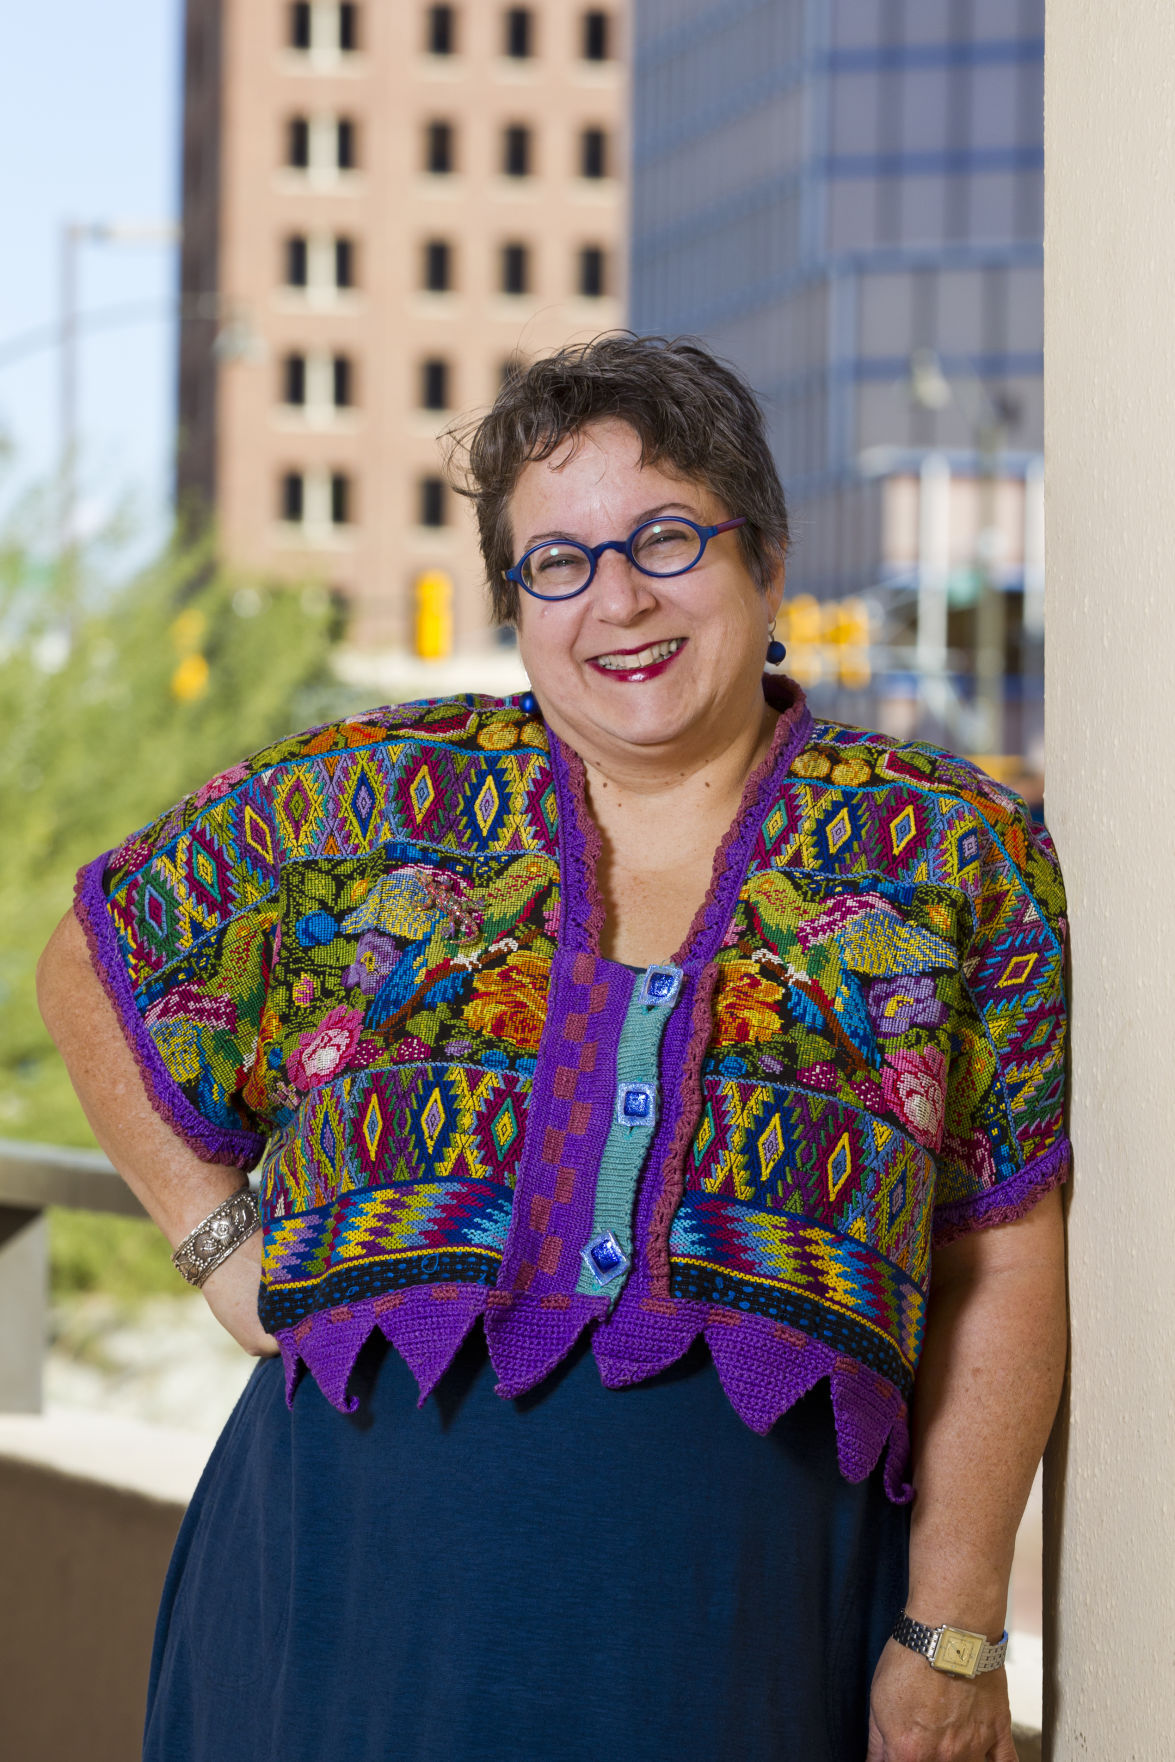 Lisa Bunker, social media librarian